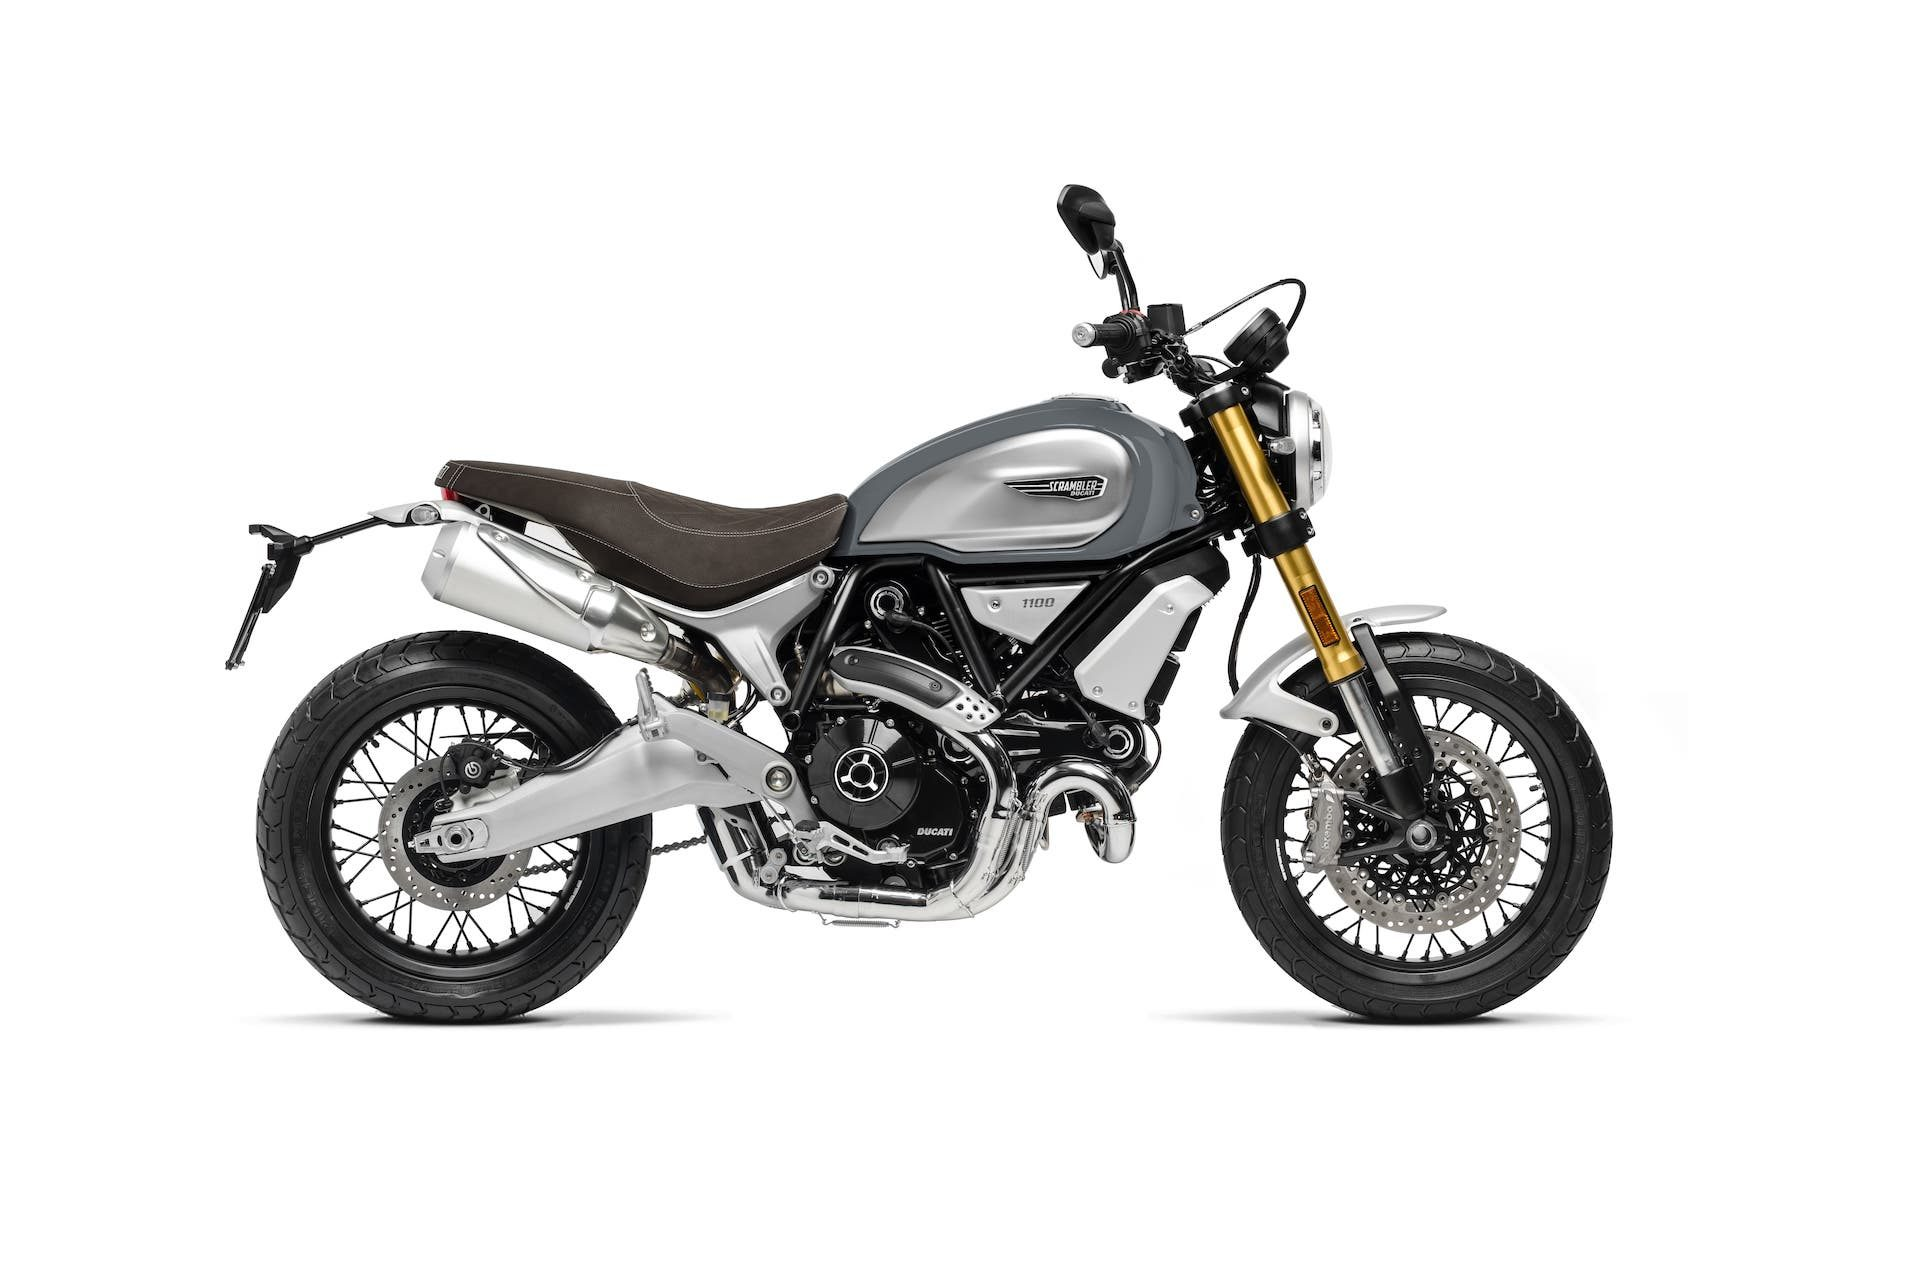 2021 Ducati Scrambler 1100 Special